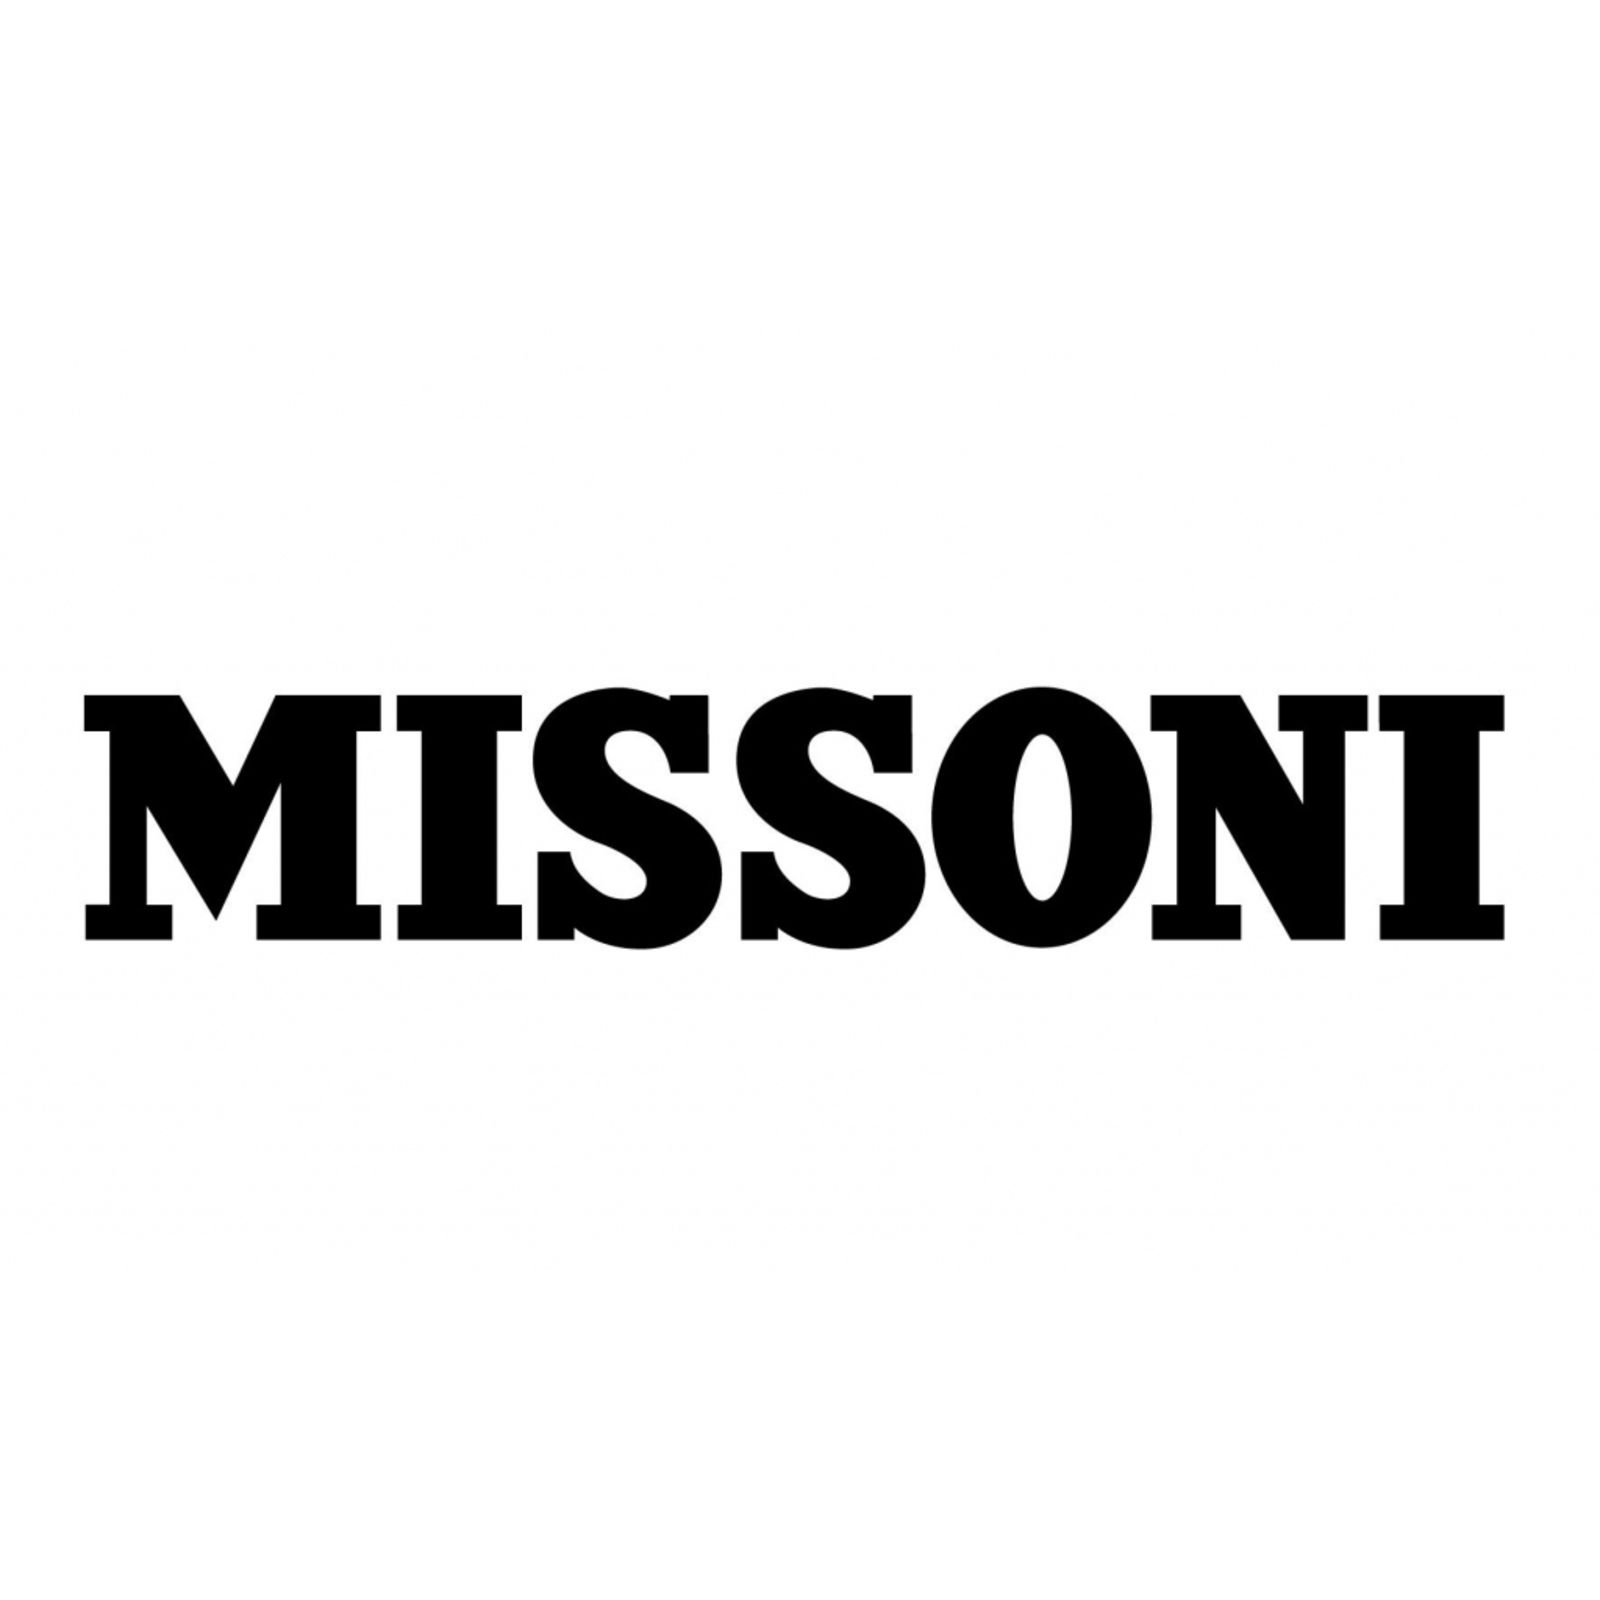 MISSONI (Изображение 1)